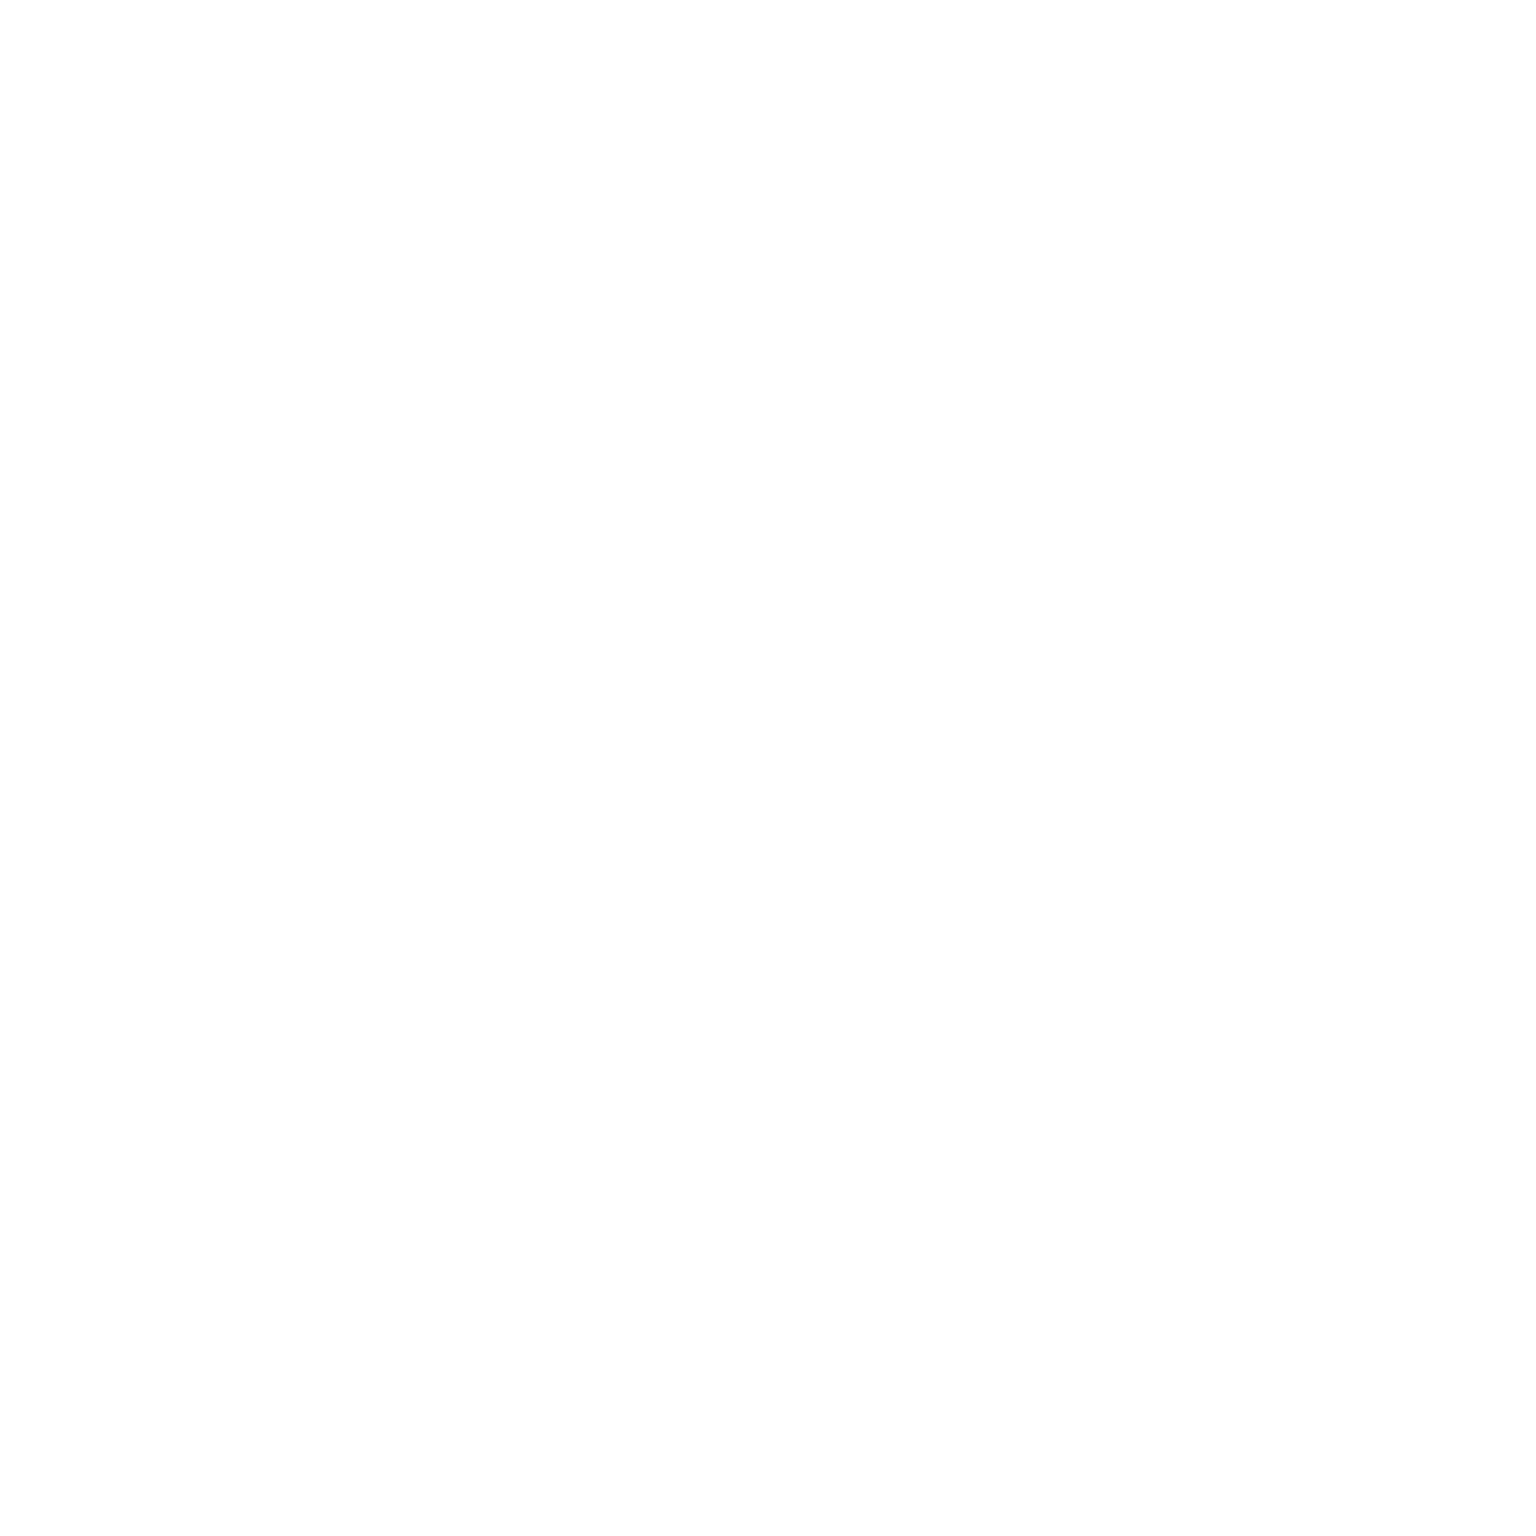 Seminario de análisis del diseño de sistemas fotovoltaicos a gran escala